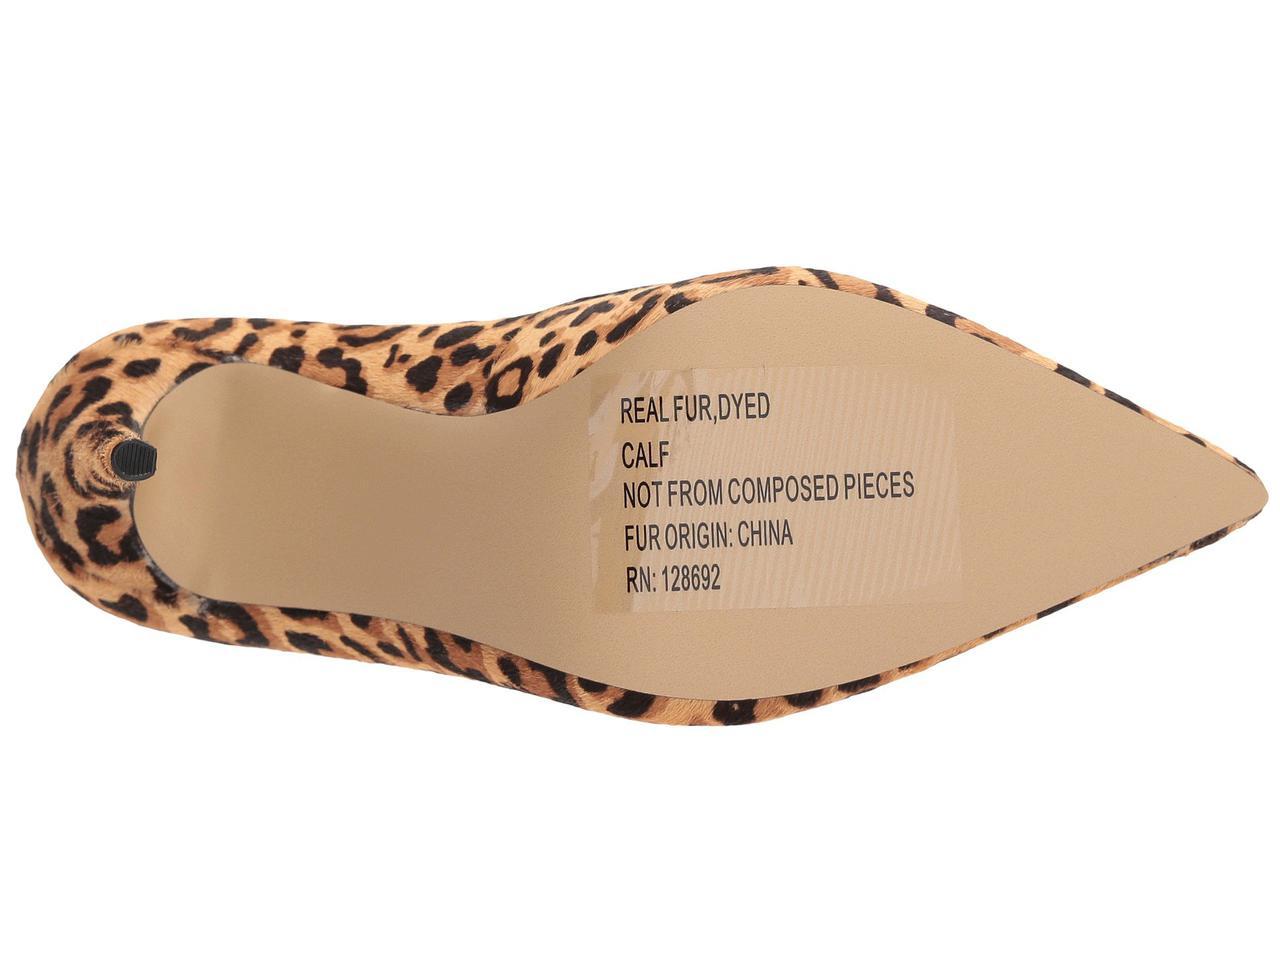 e1144e6f8fd Туфли на каблуке (Оригинал) Steve Madden Daisie-L Pump Leopard ...